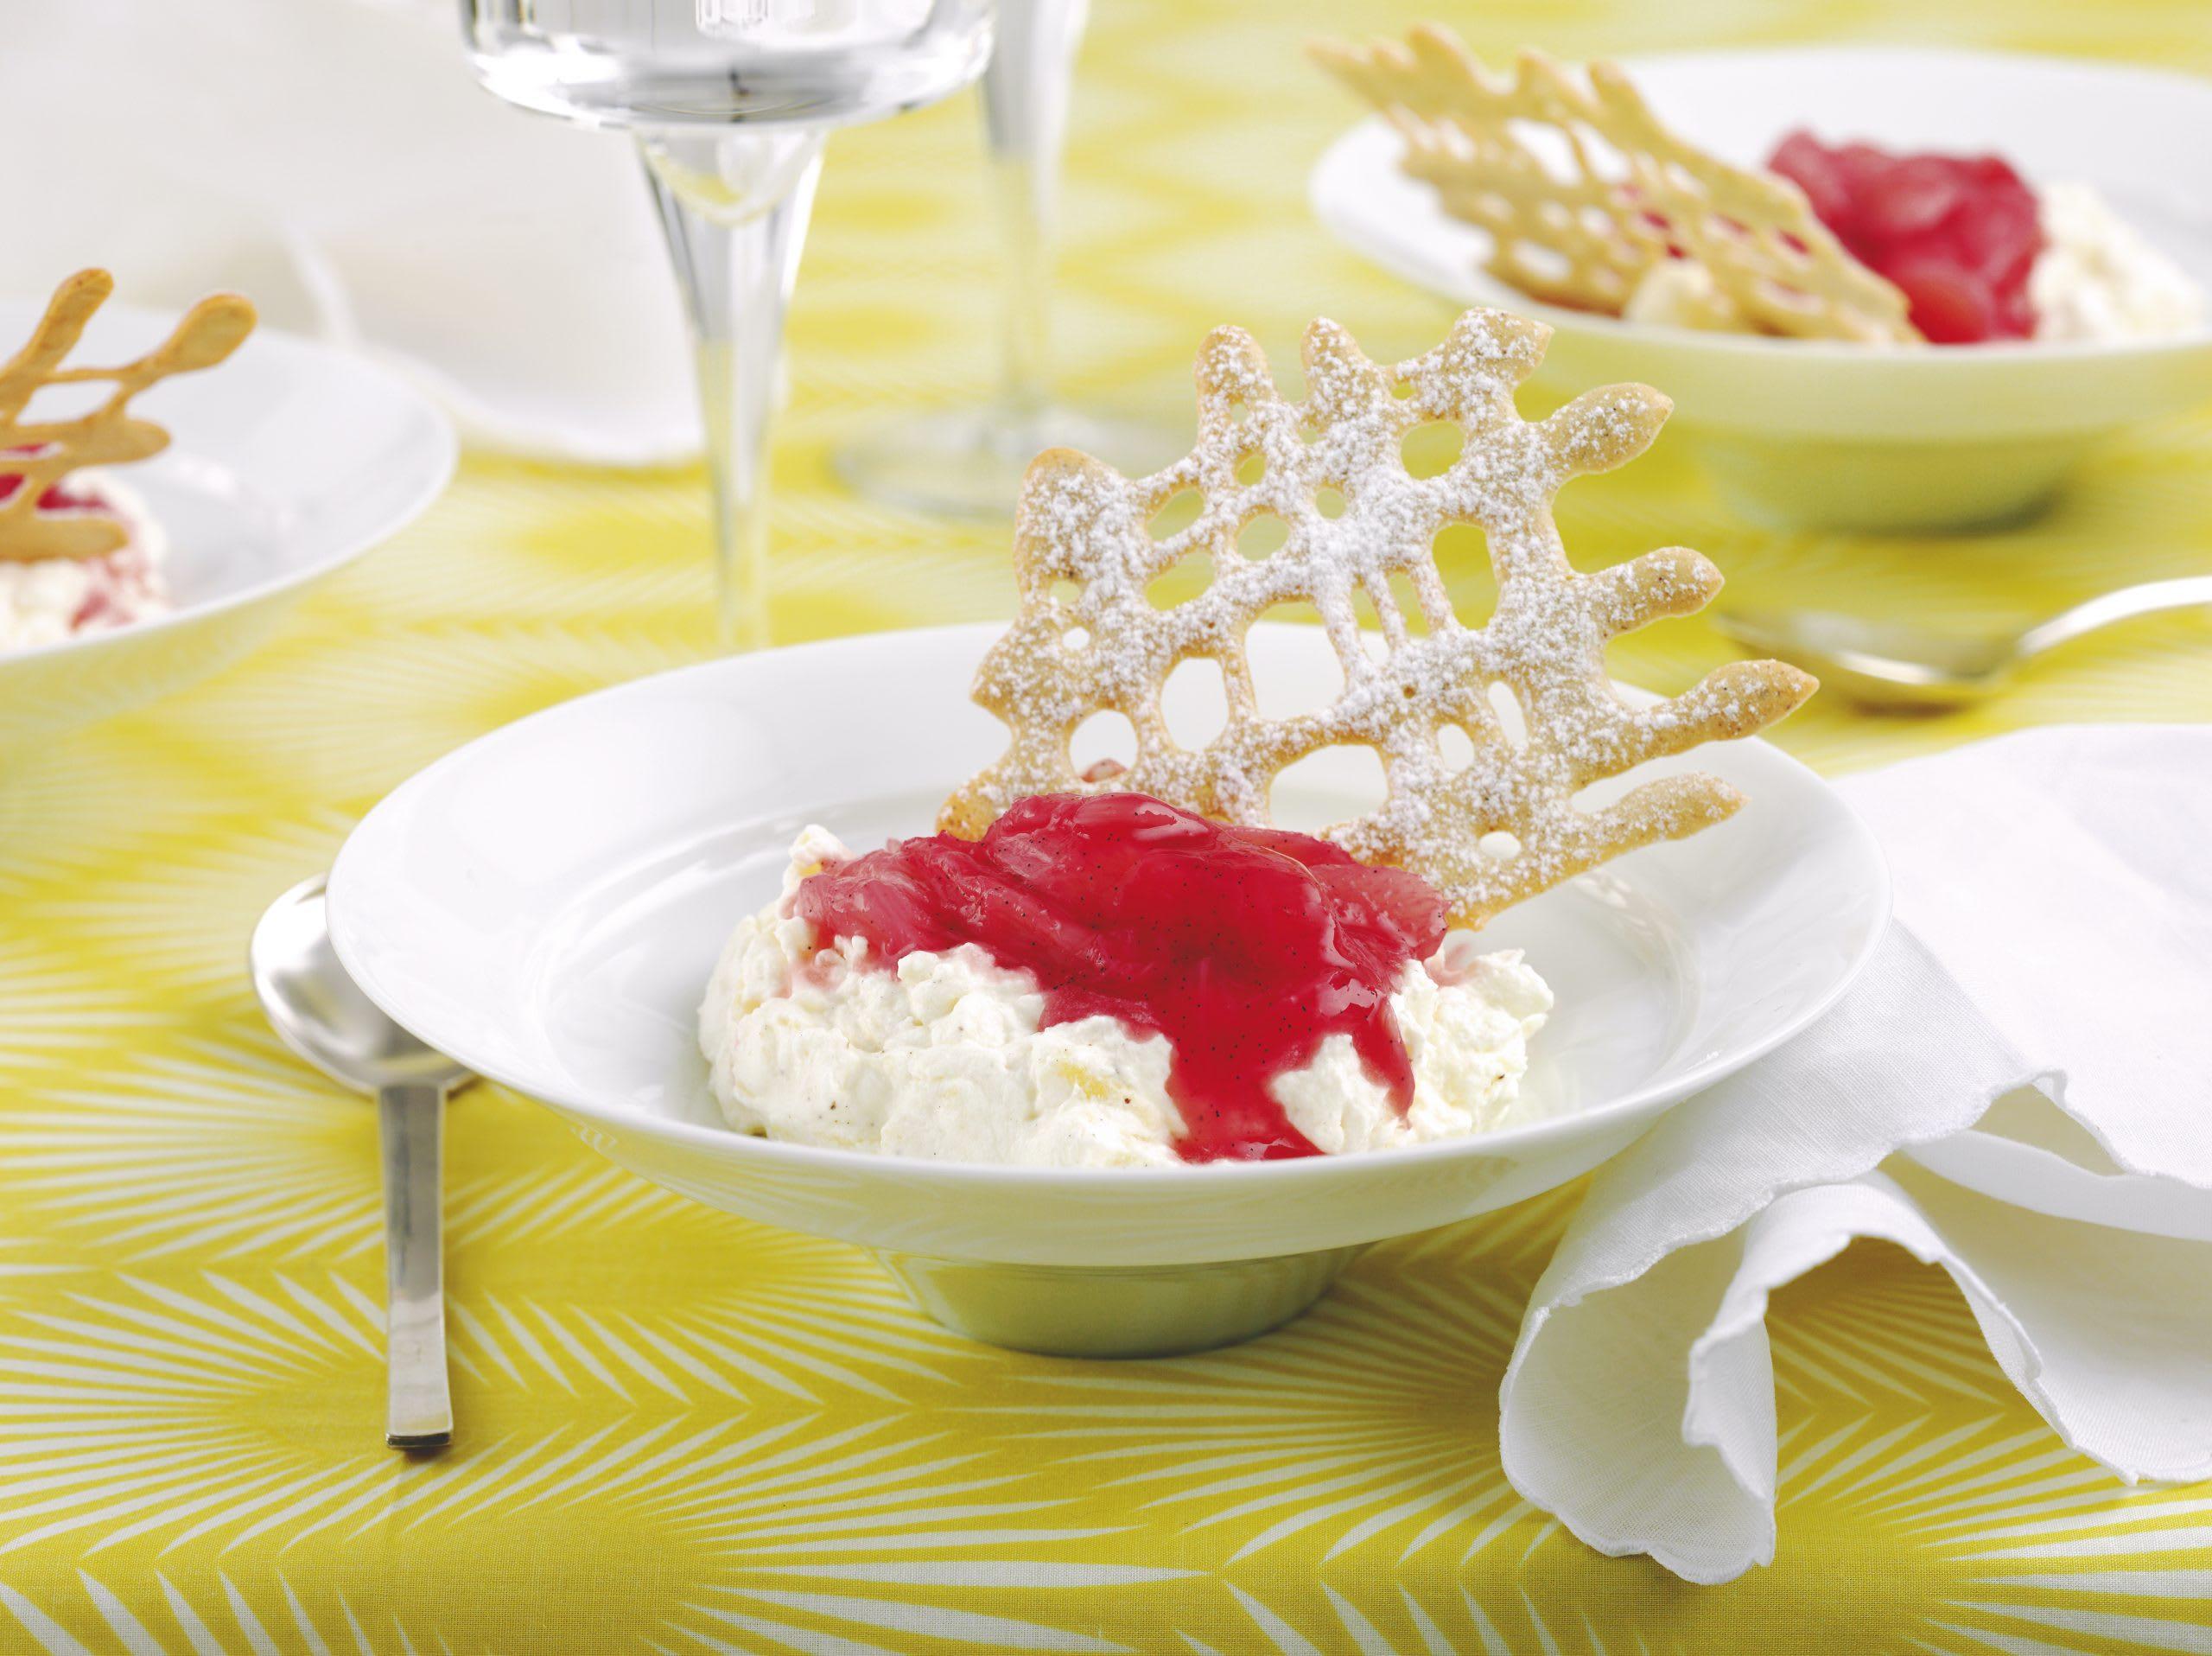 Rhabarber-Apfel-Crème mit Knusper-Gitter